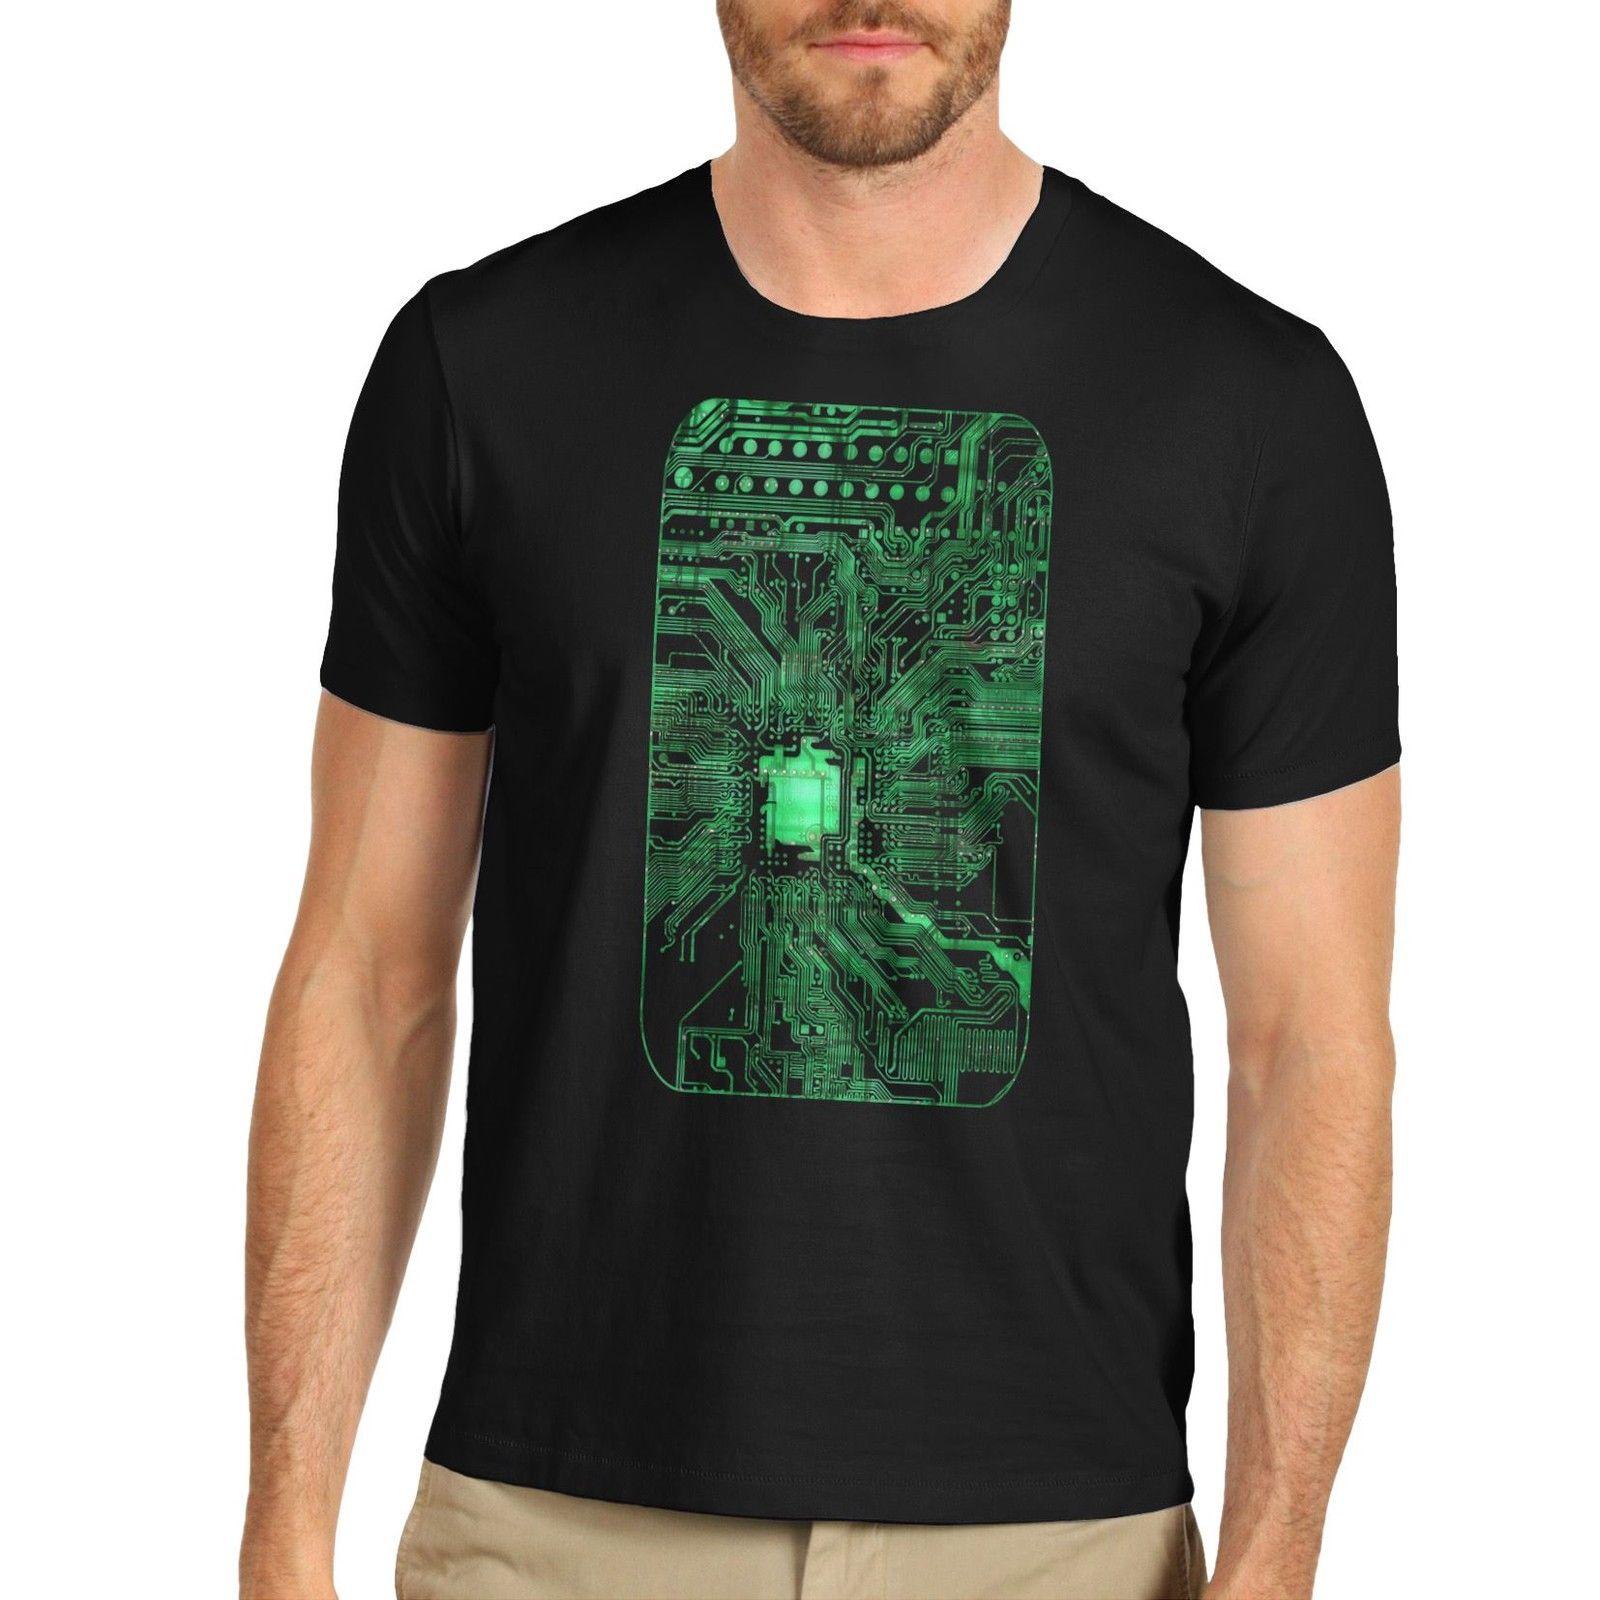 T Shirts Clothing Free Shipping O-Neck Short Sleeve Fashion Mens Electronic Cool Design Circuit Board Print T Shirts